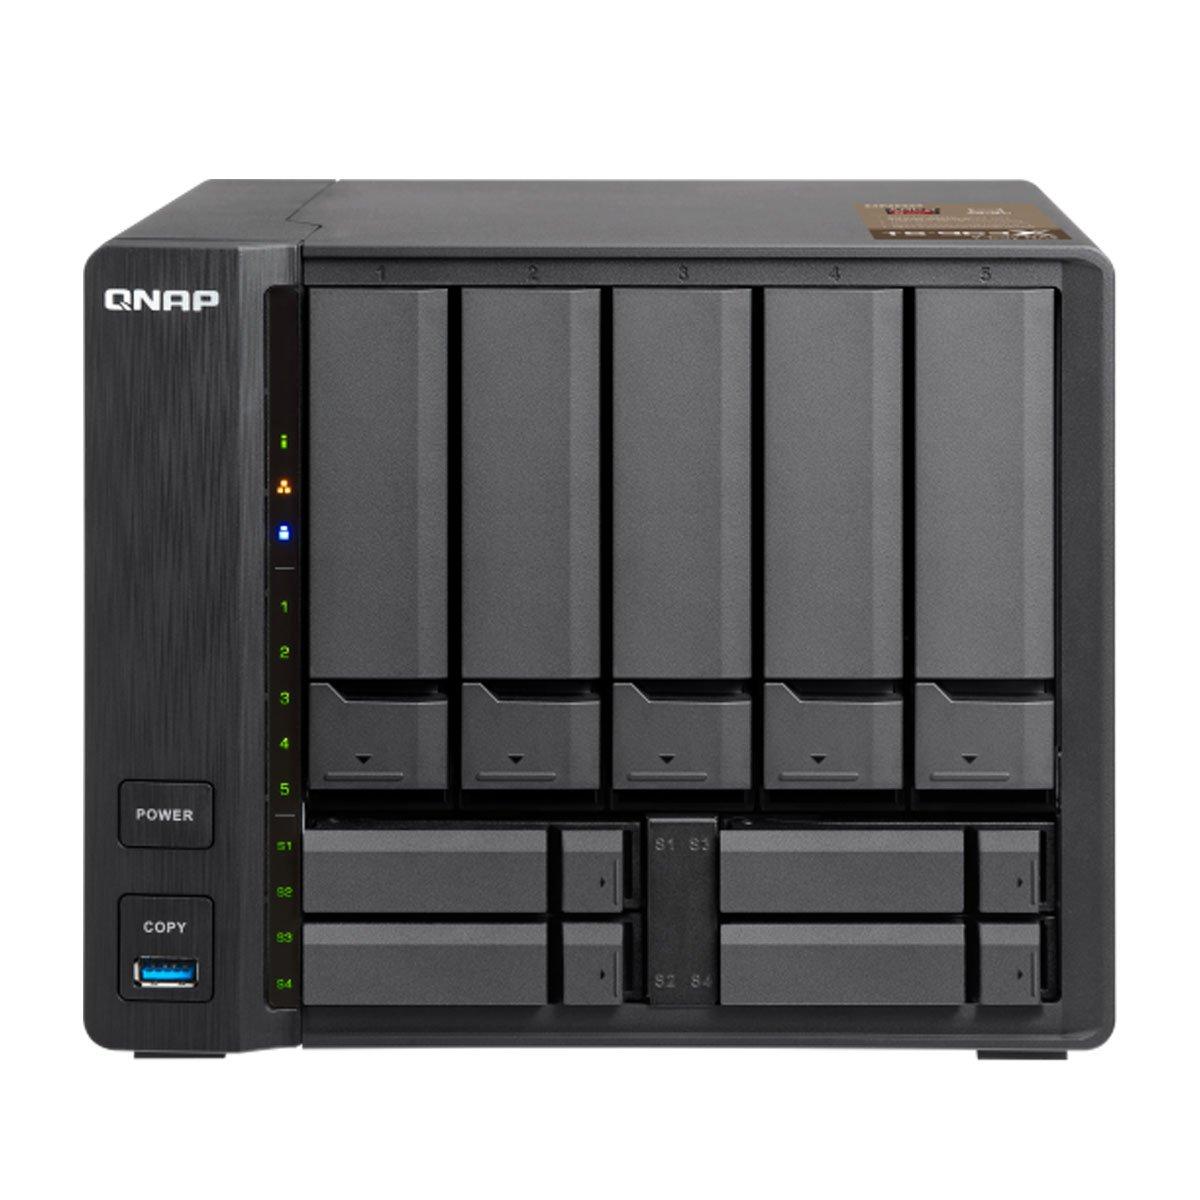 QNAP TS-963X-8G-US 5 (+4) Bay 10G AMD 64Bit X86-Based NAS, Quad Core 2.0GHz, 8GB RAM, 1 X 1GbE, 1 X 10GbE (10Gbase-T)